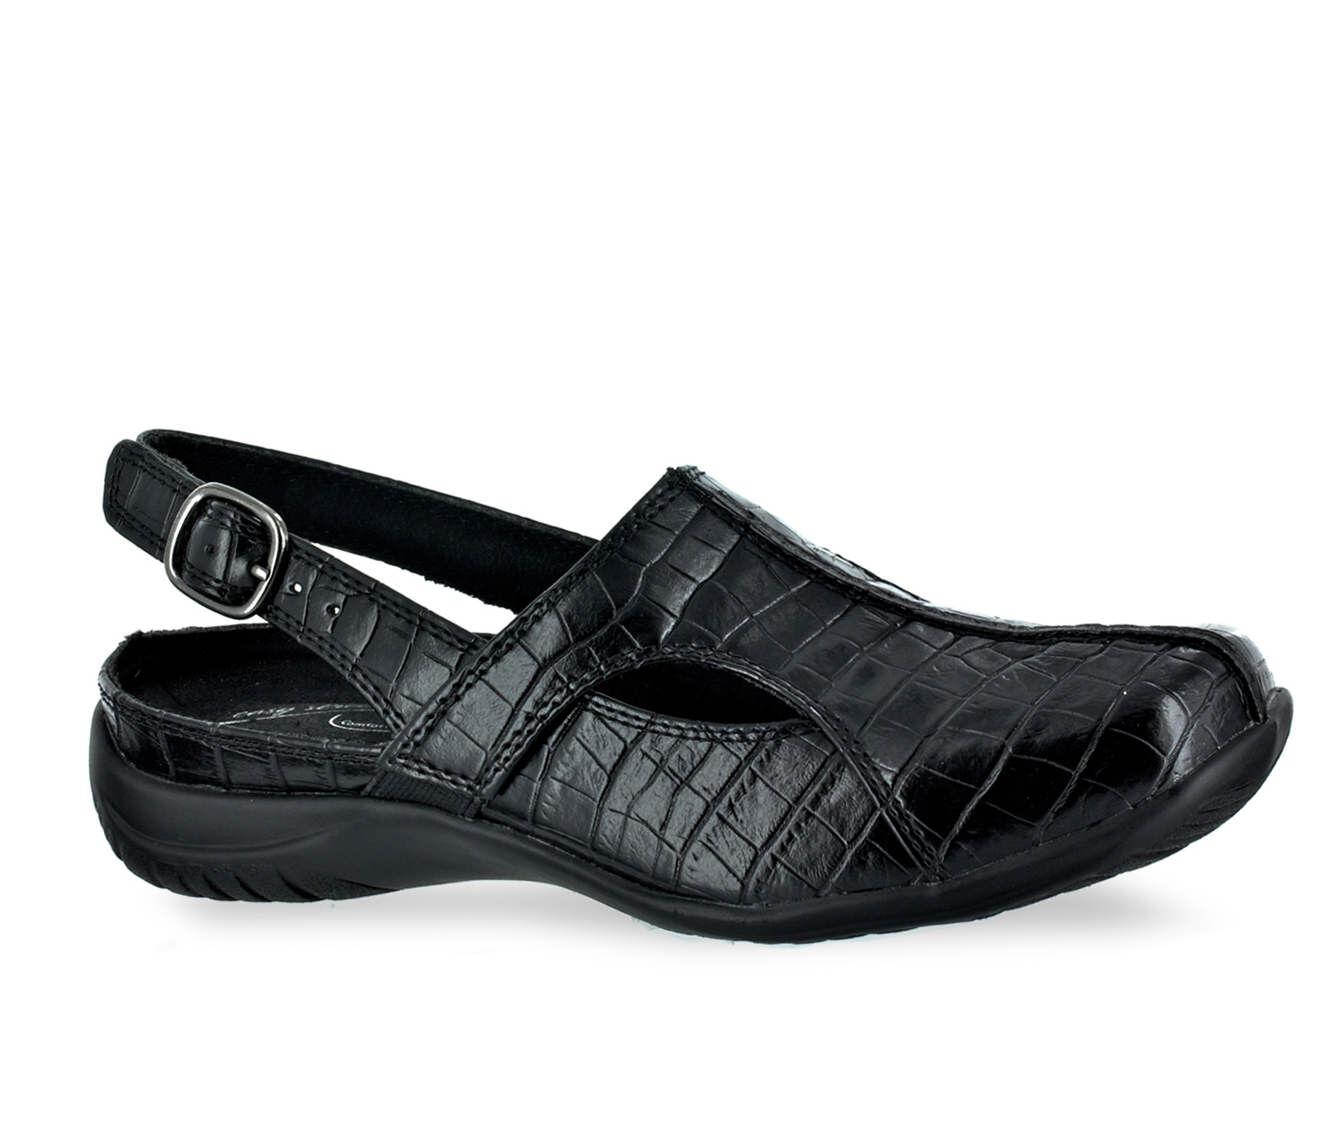 Women's Easy Street Sportser Shoes Black Croco